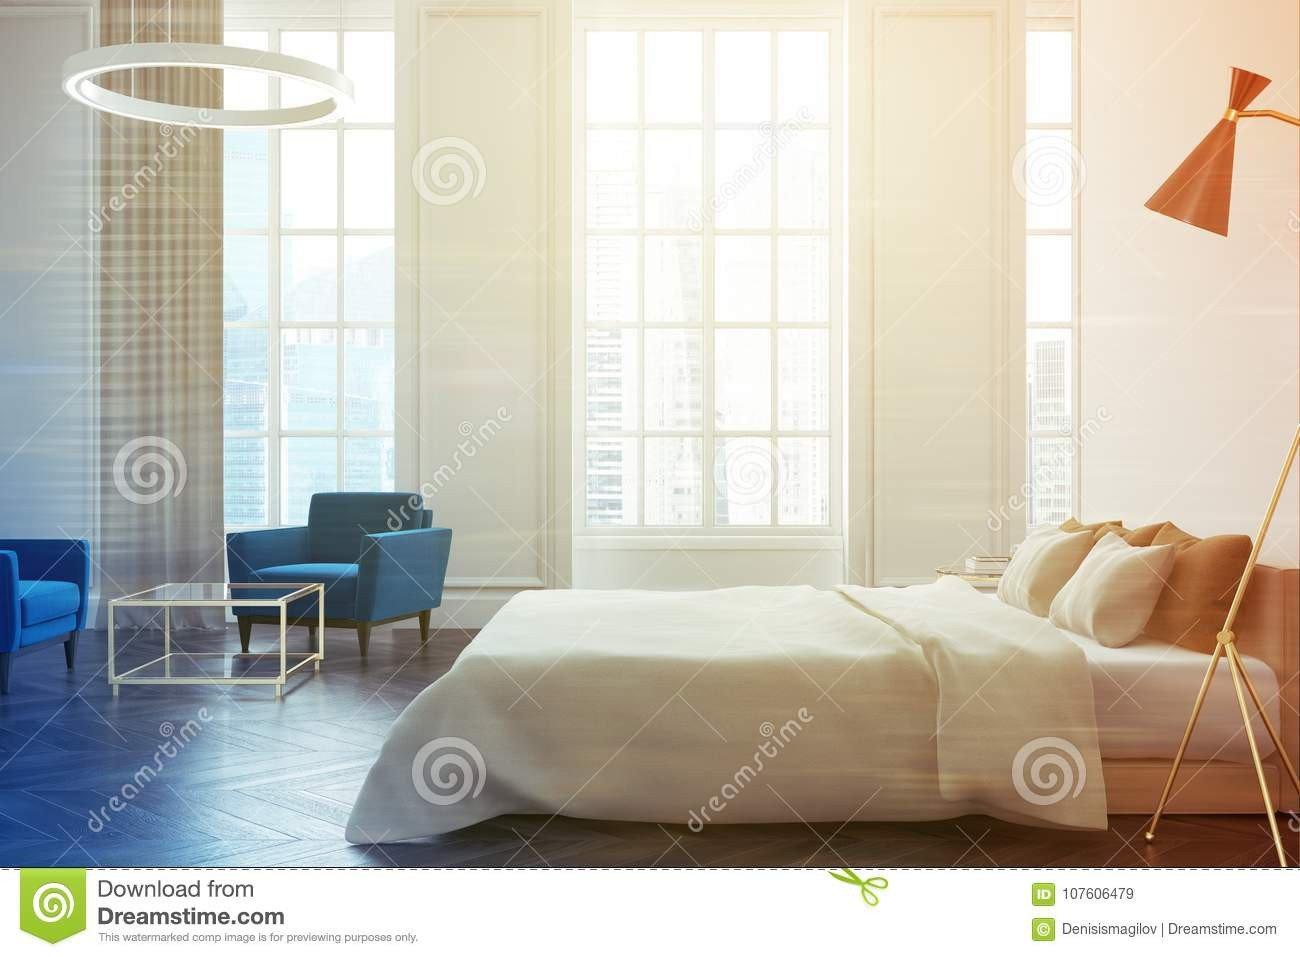 Dark Wood Floor Bedroom Fresh White Bedroom Interior Side toned Stock Illustration